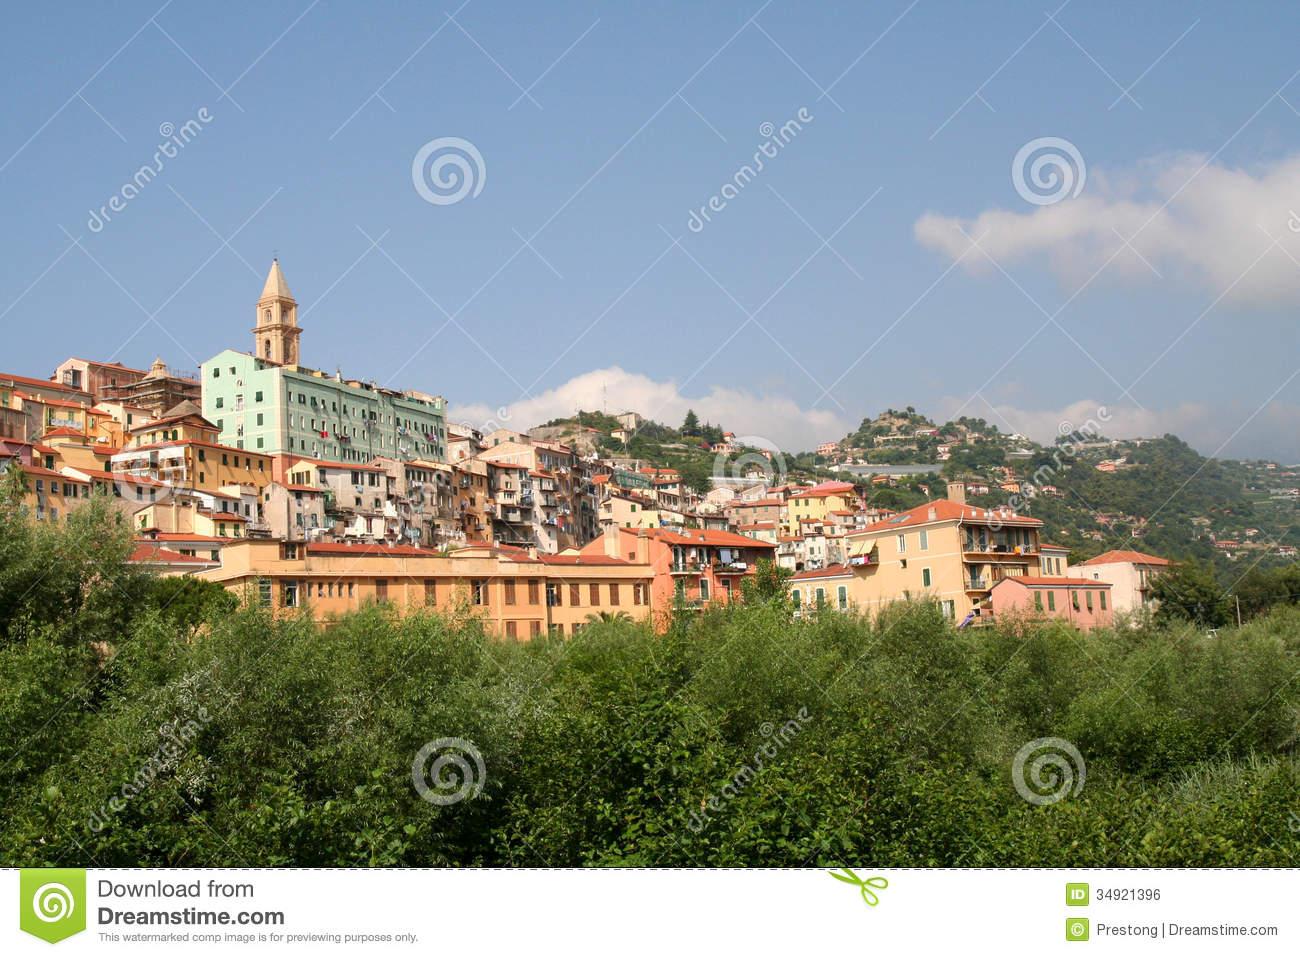 Ventimiglia Alta. Royalty Free Stock Image.